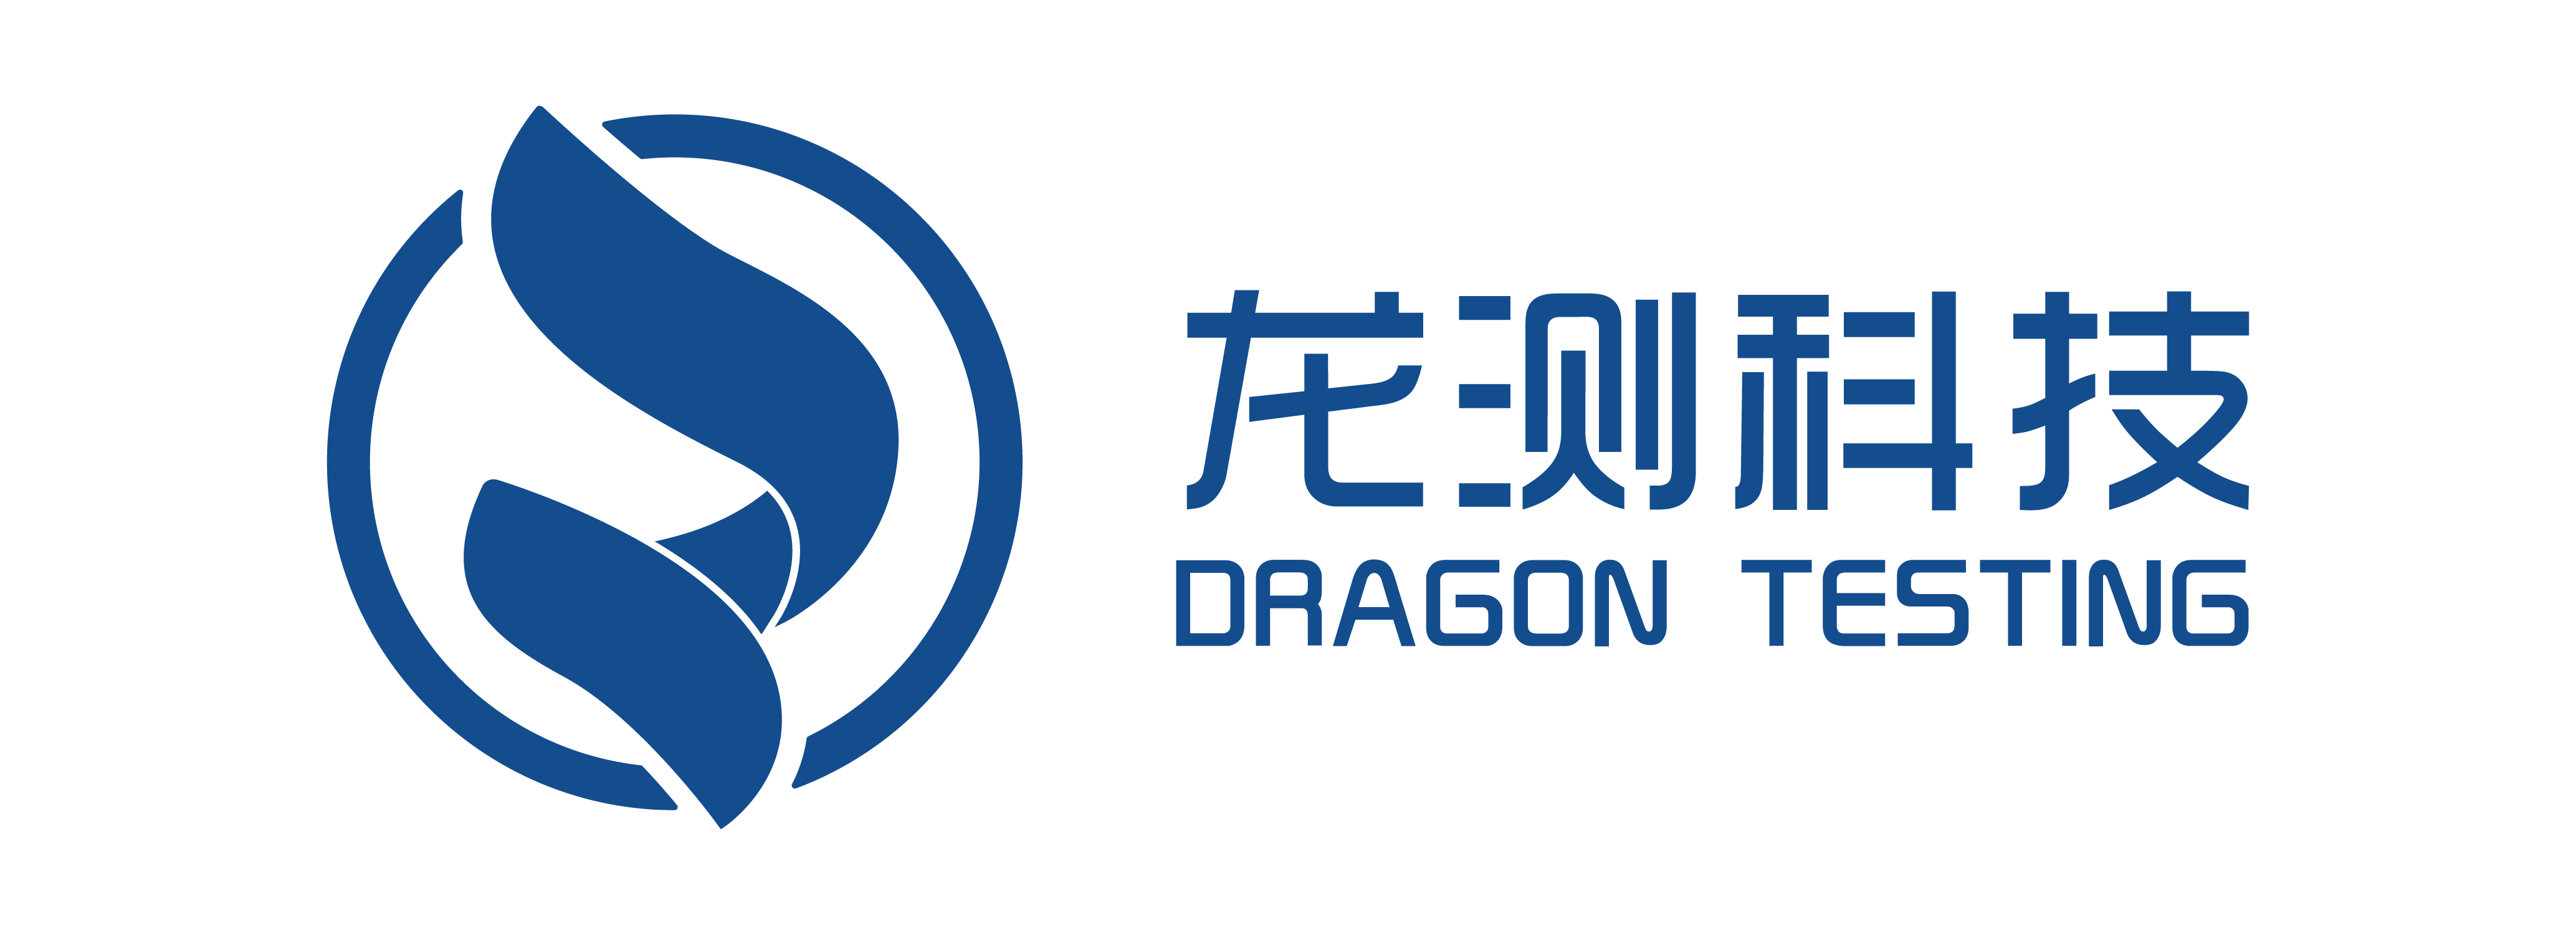 Dragon Testing